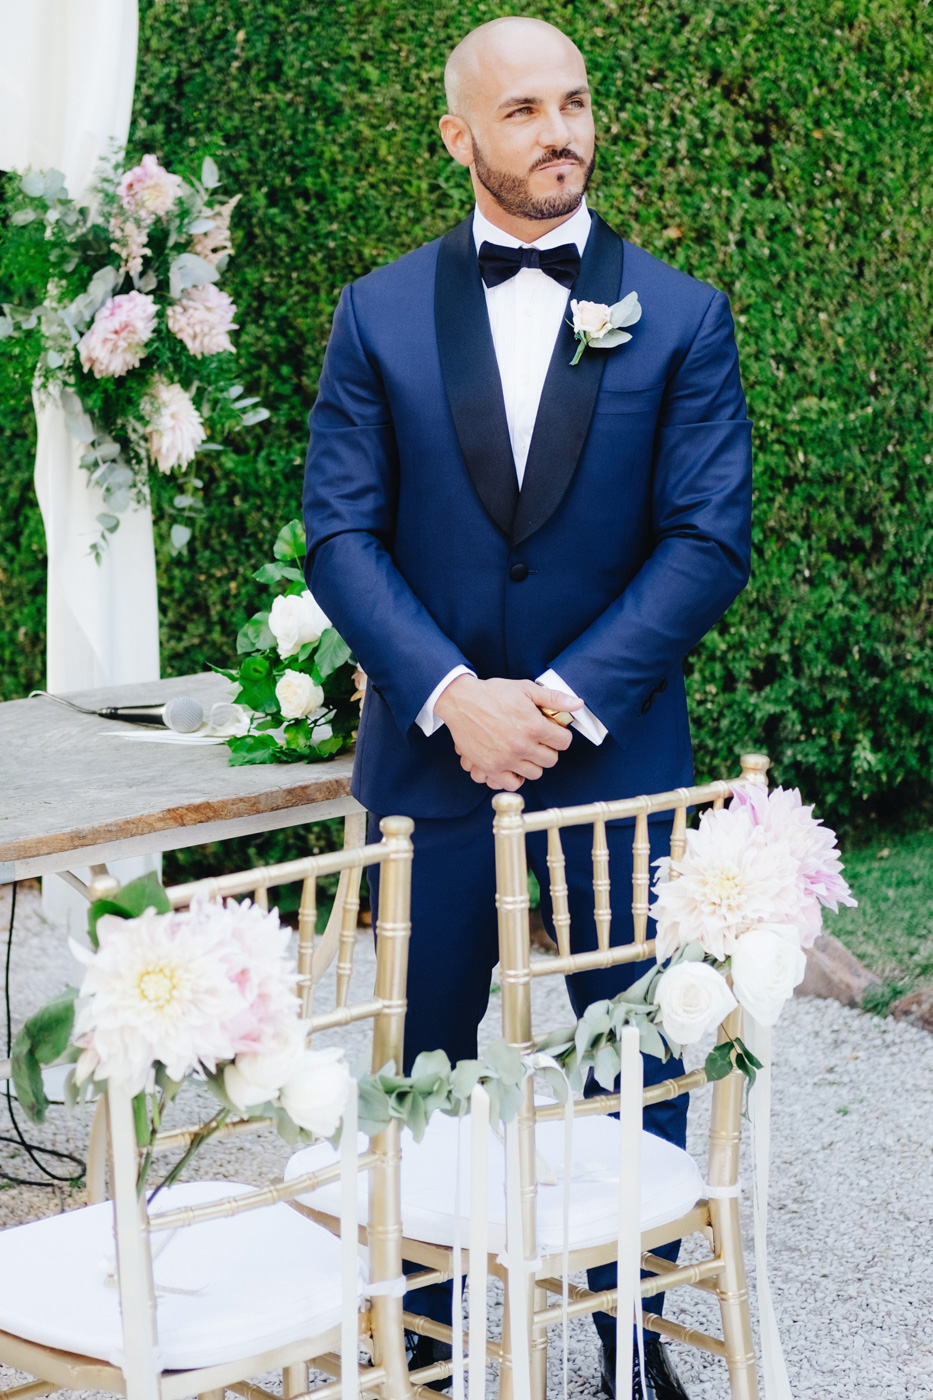 Matrimoni all'italiana wedding photographer italy-62.jpg